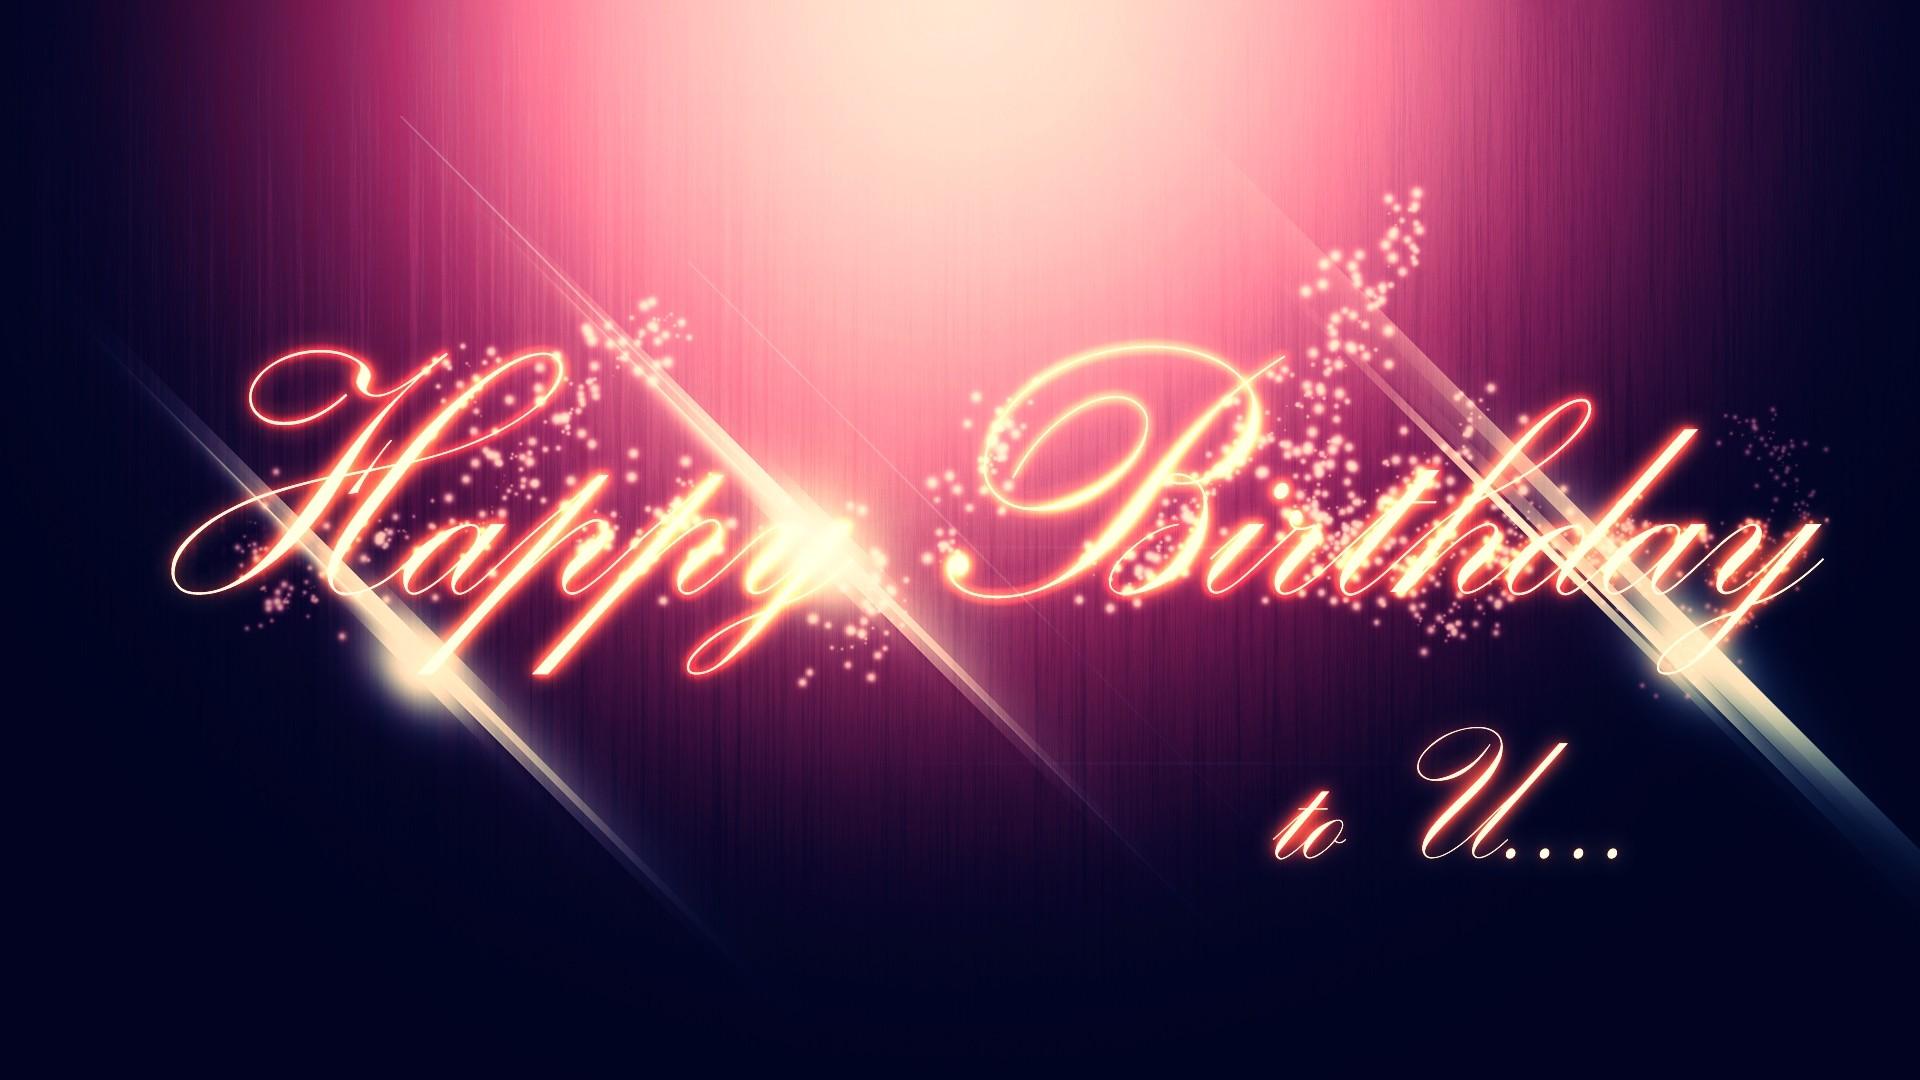 Happy Birthday Animation Hd Beautiful Desktop Wallpapers